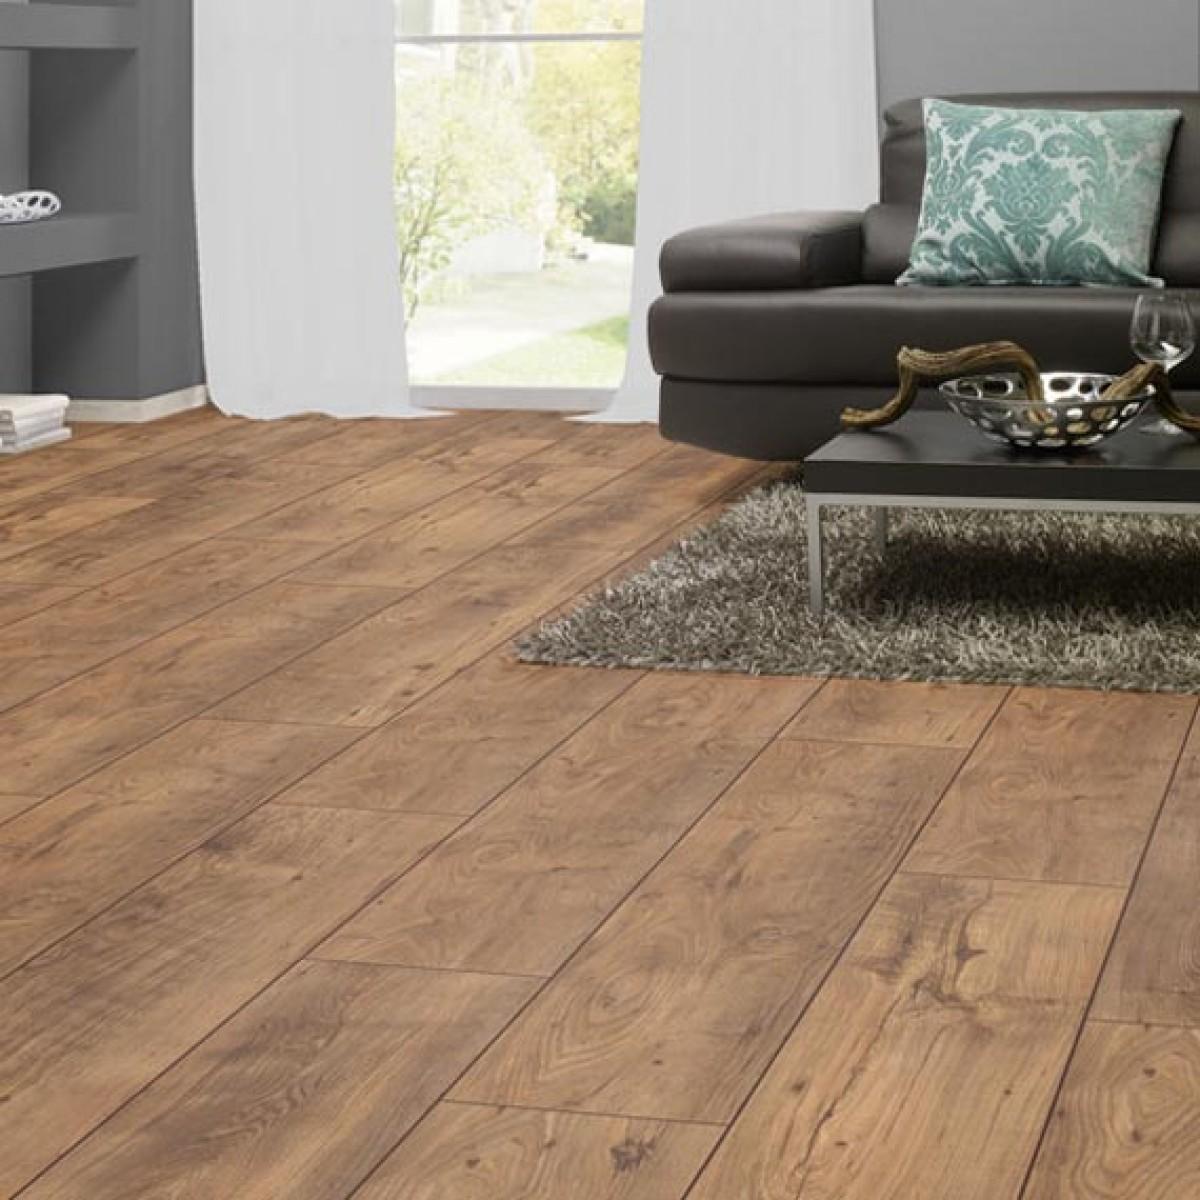 Contemporary laminating flooring previous; next UBPORYG